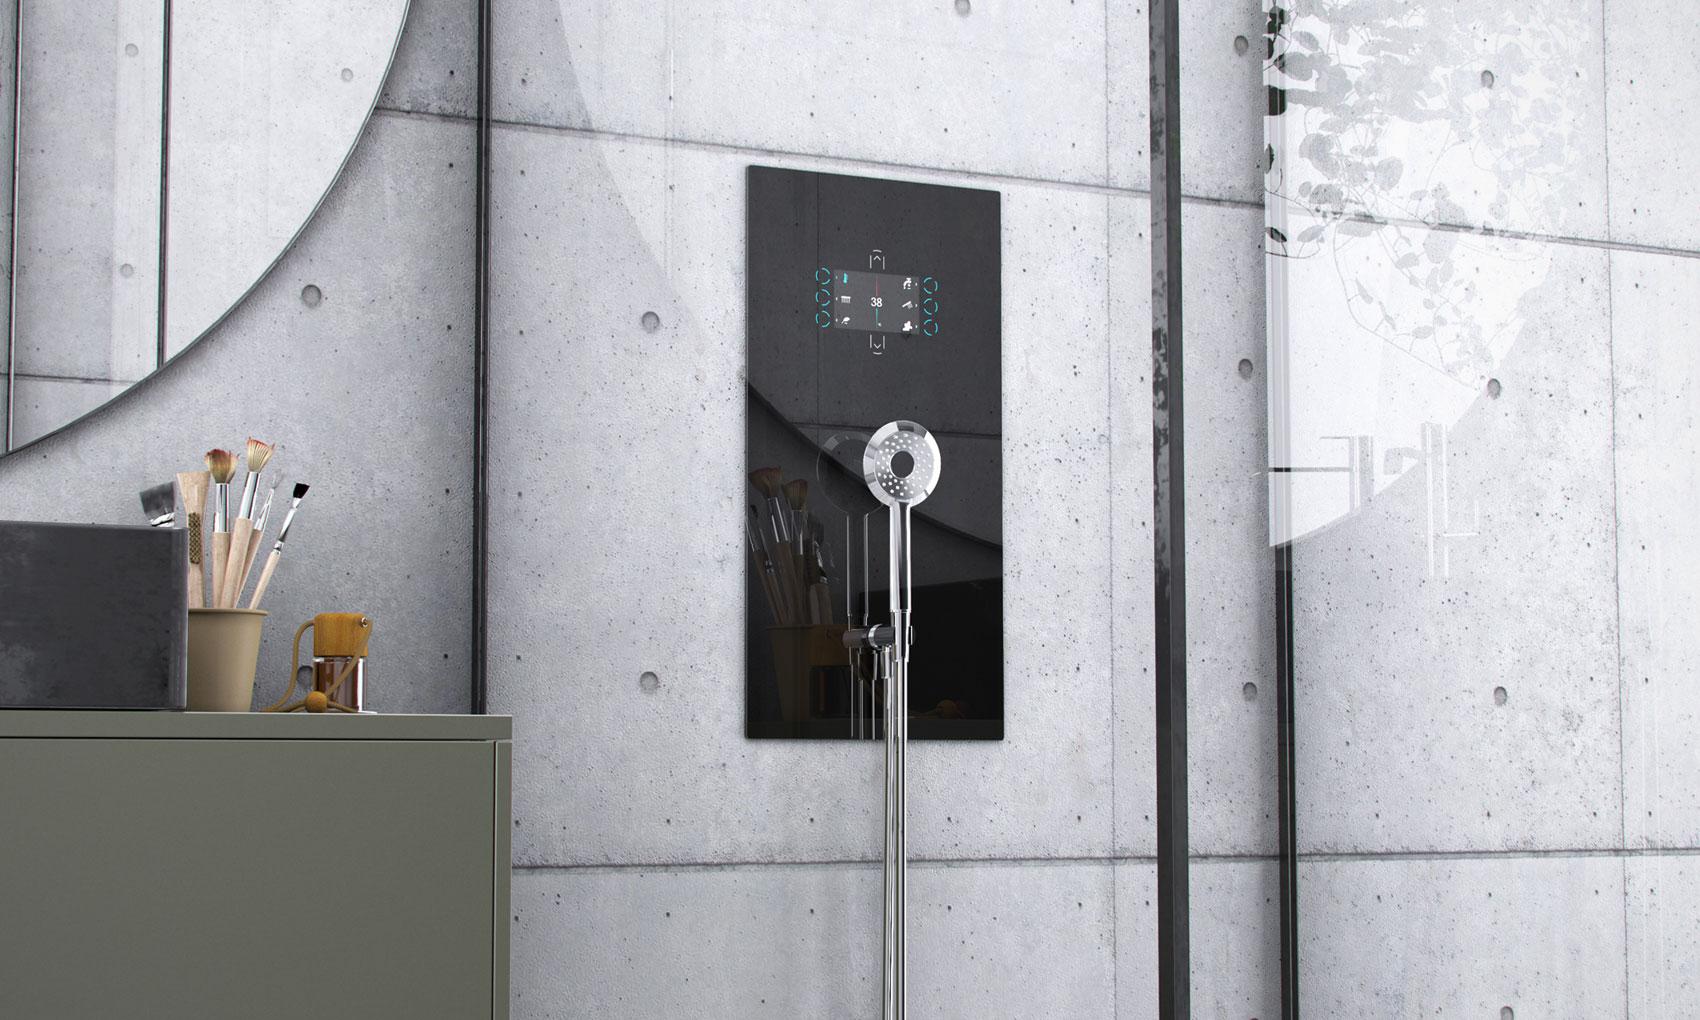 05-douche-showerpad-insens-inman